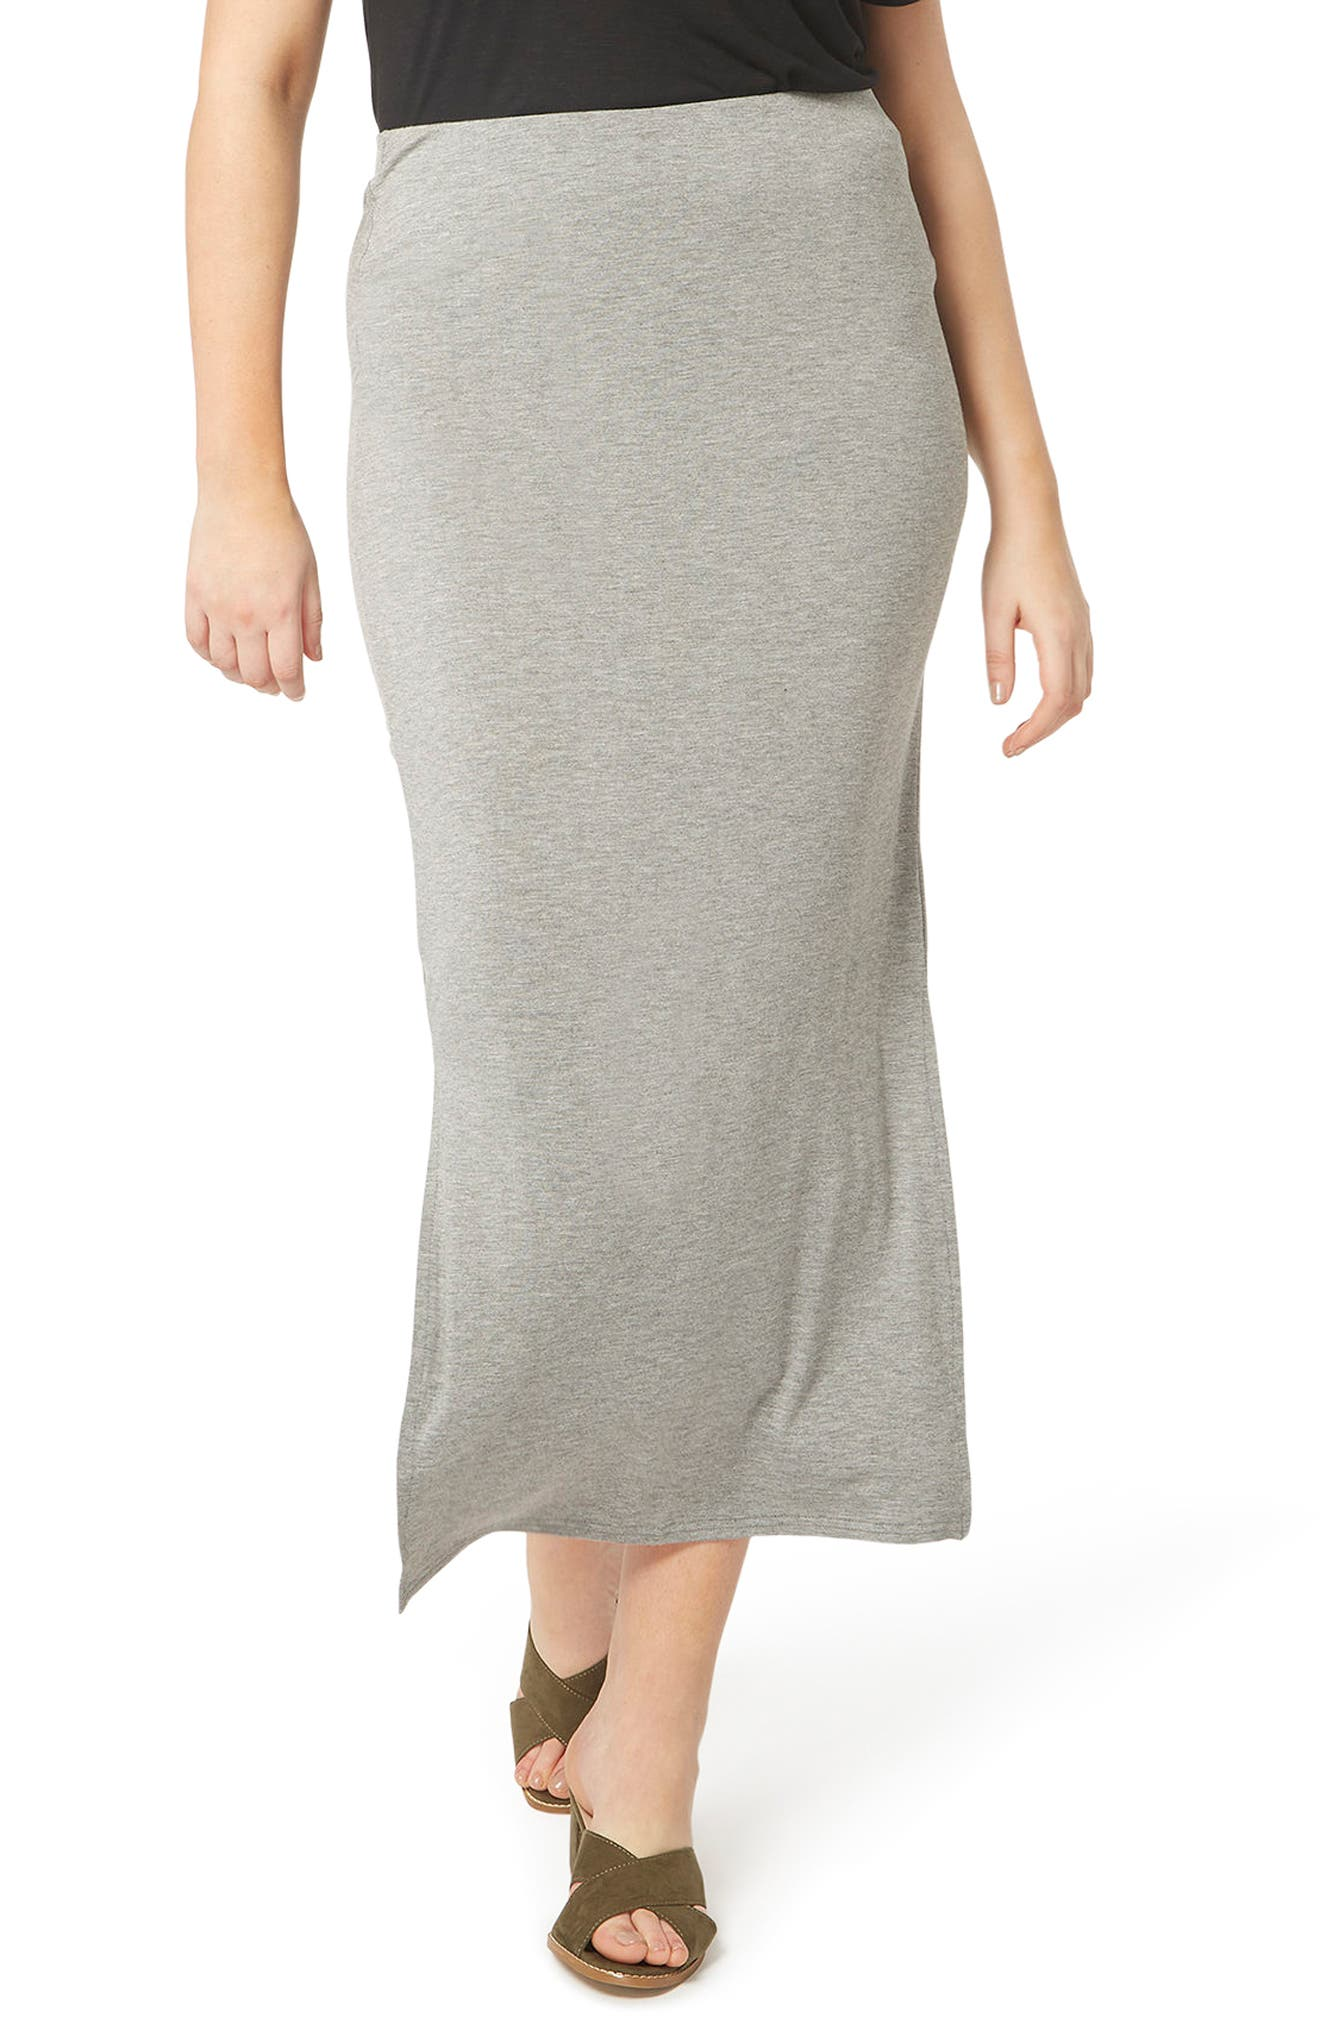 stretch knit midi skirt plus size nordstrom